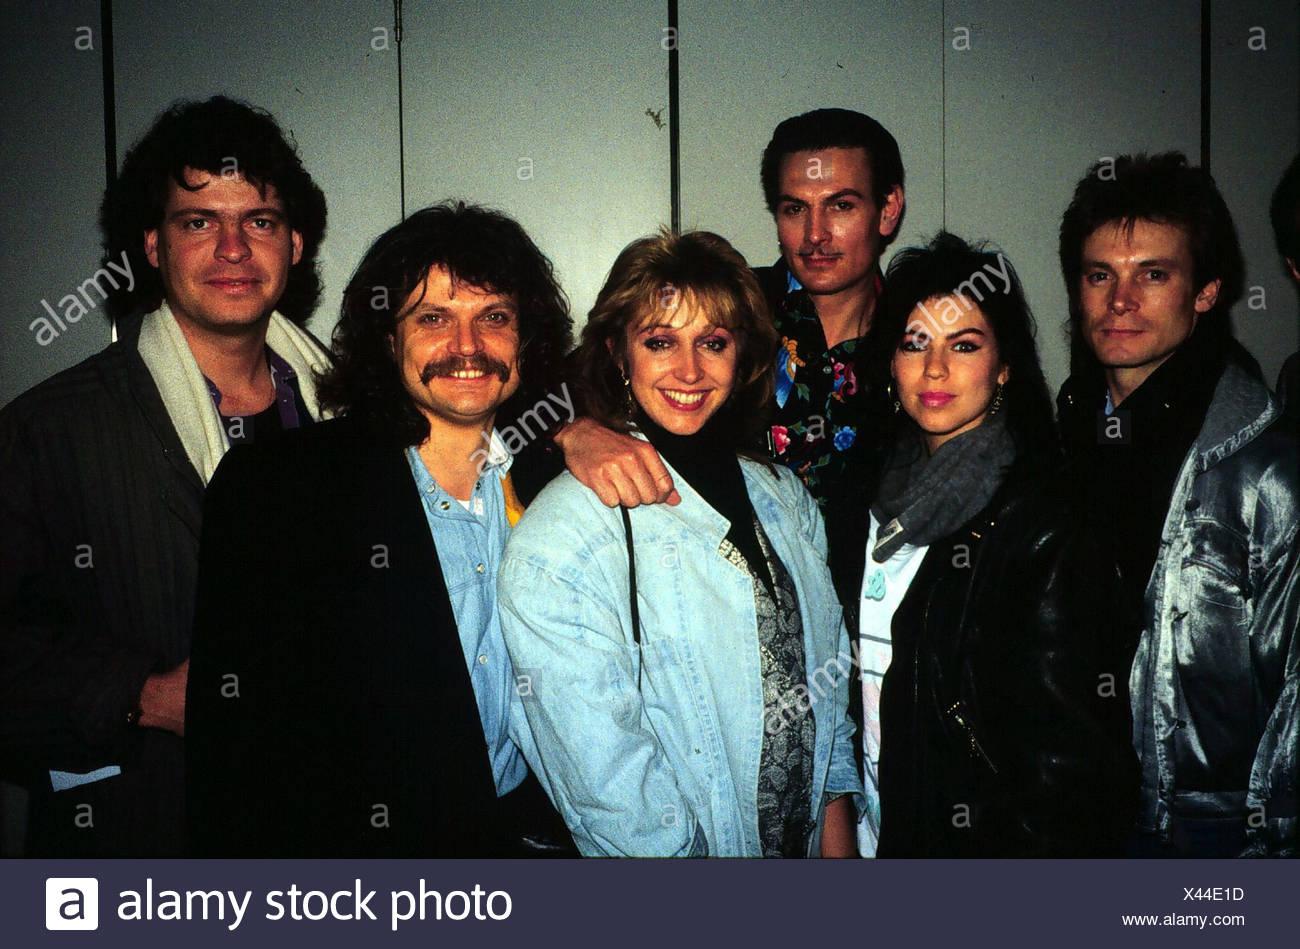 Genghis Khan (Dschinghis Khan), German pop group, group picture, early 1980s, Leslie Mandoki, Henriette Heichel, Edina Pop, Stev Stock Photo